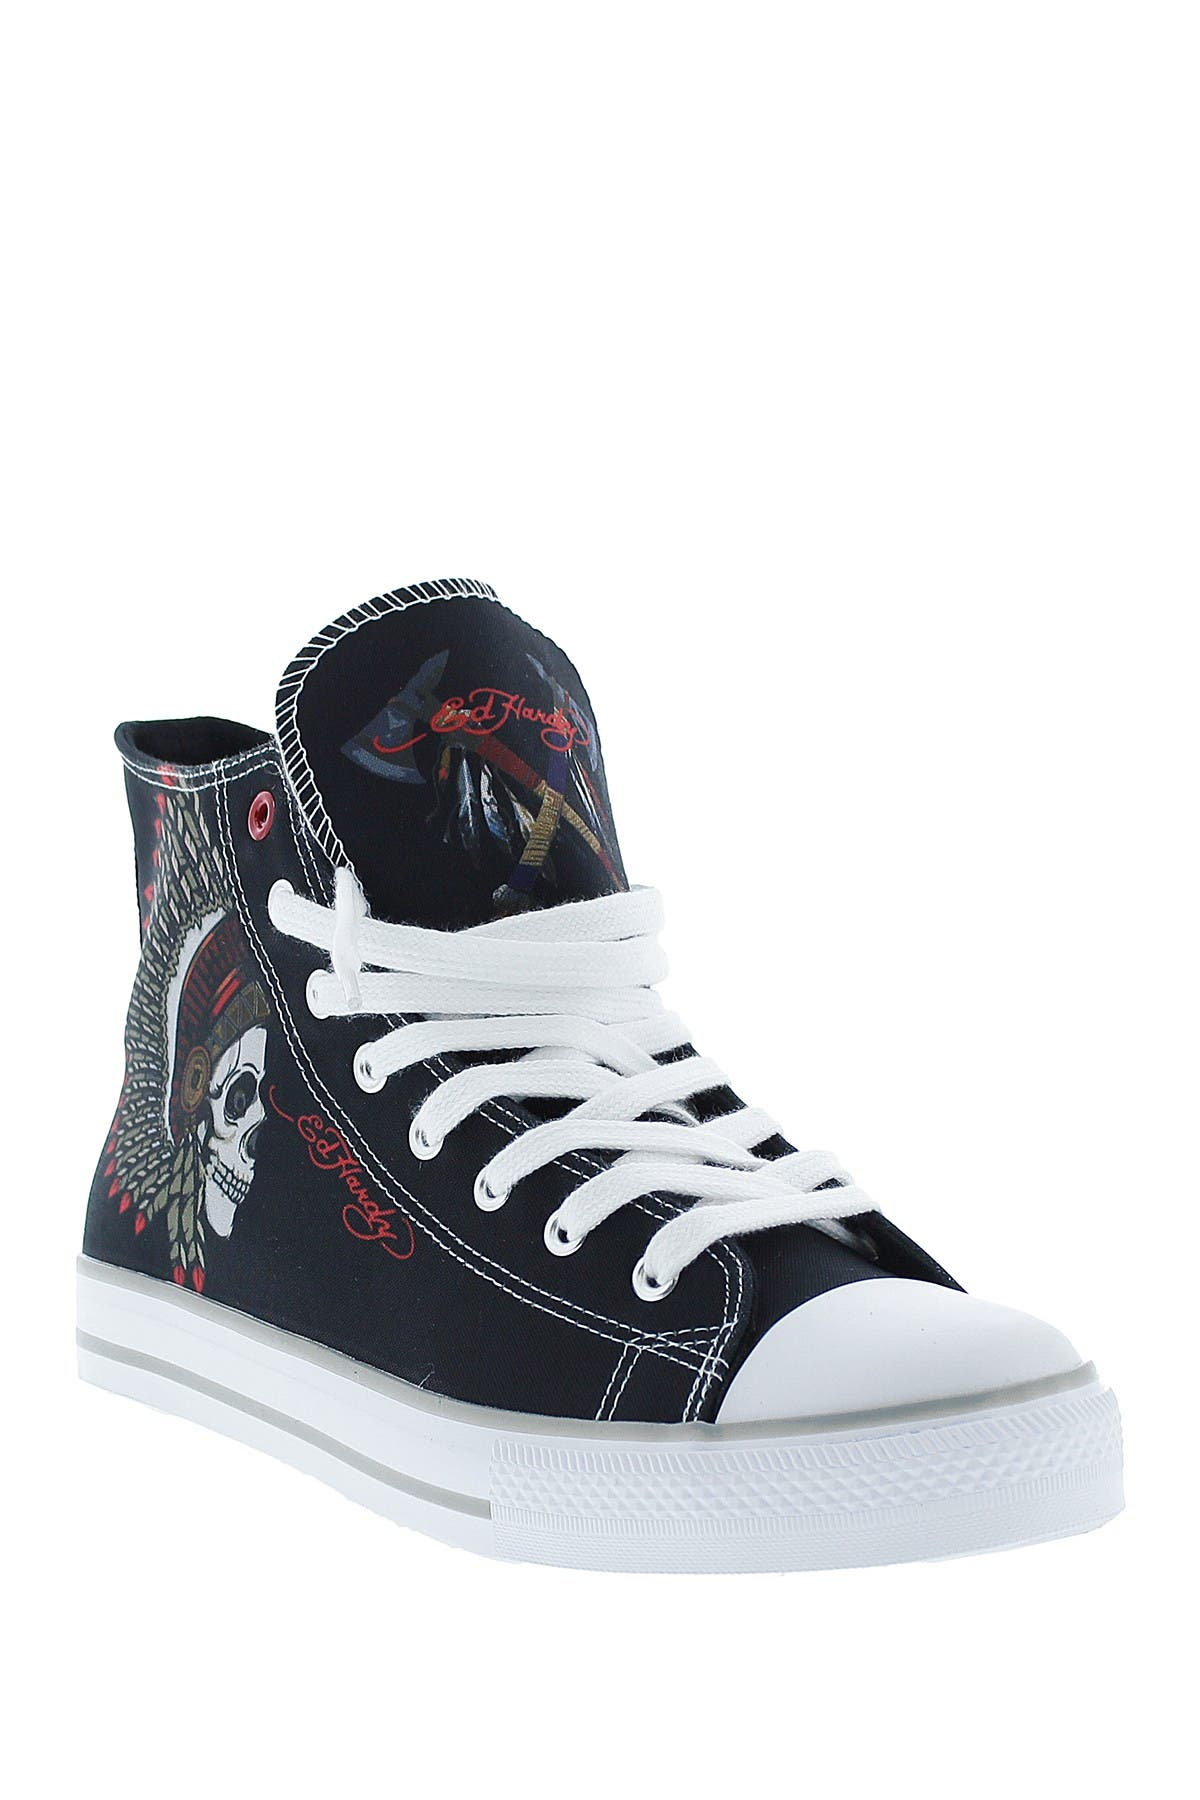 Image of Ed Hardy Skull High Top Sneaker